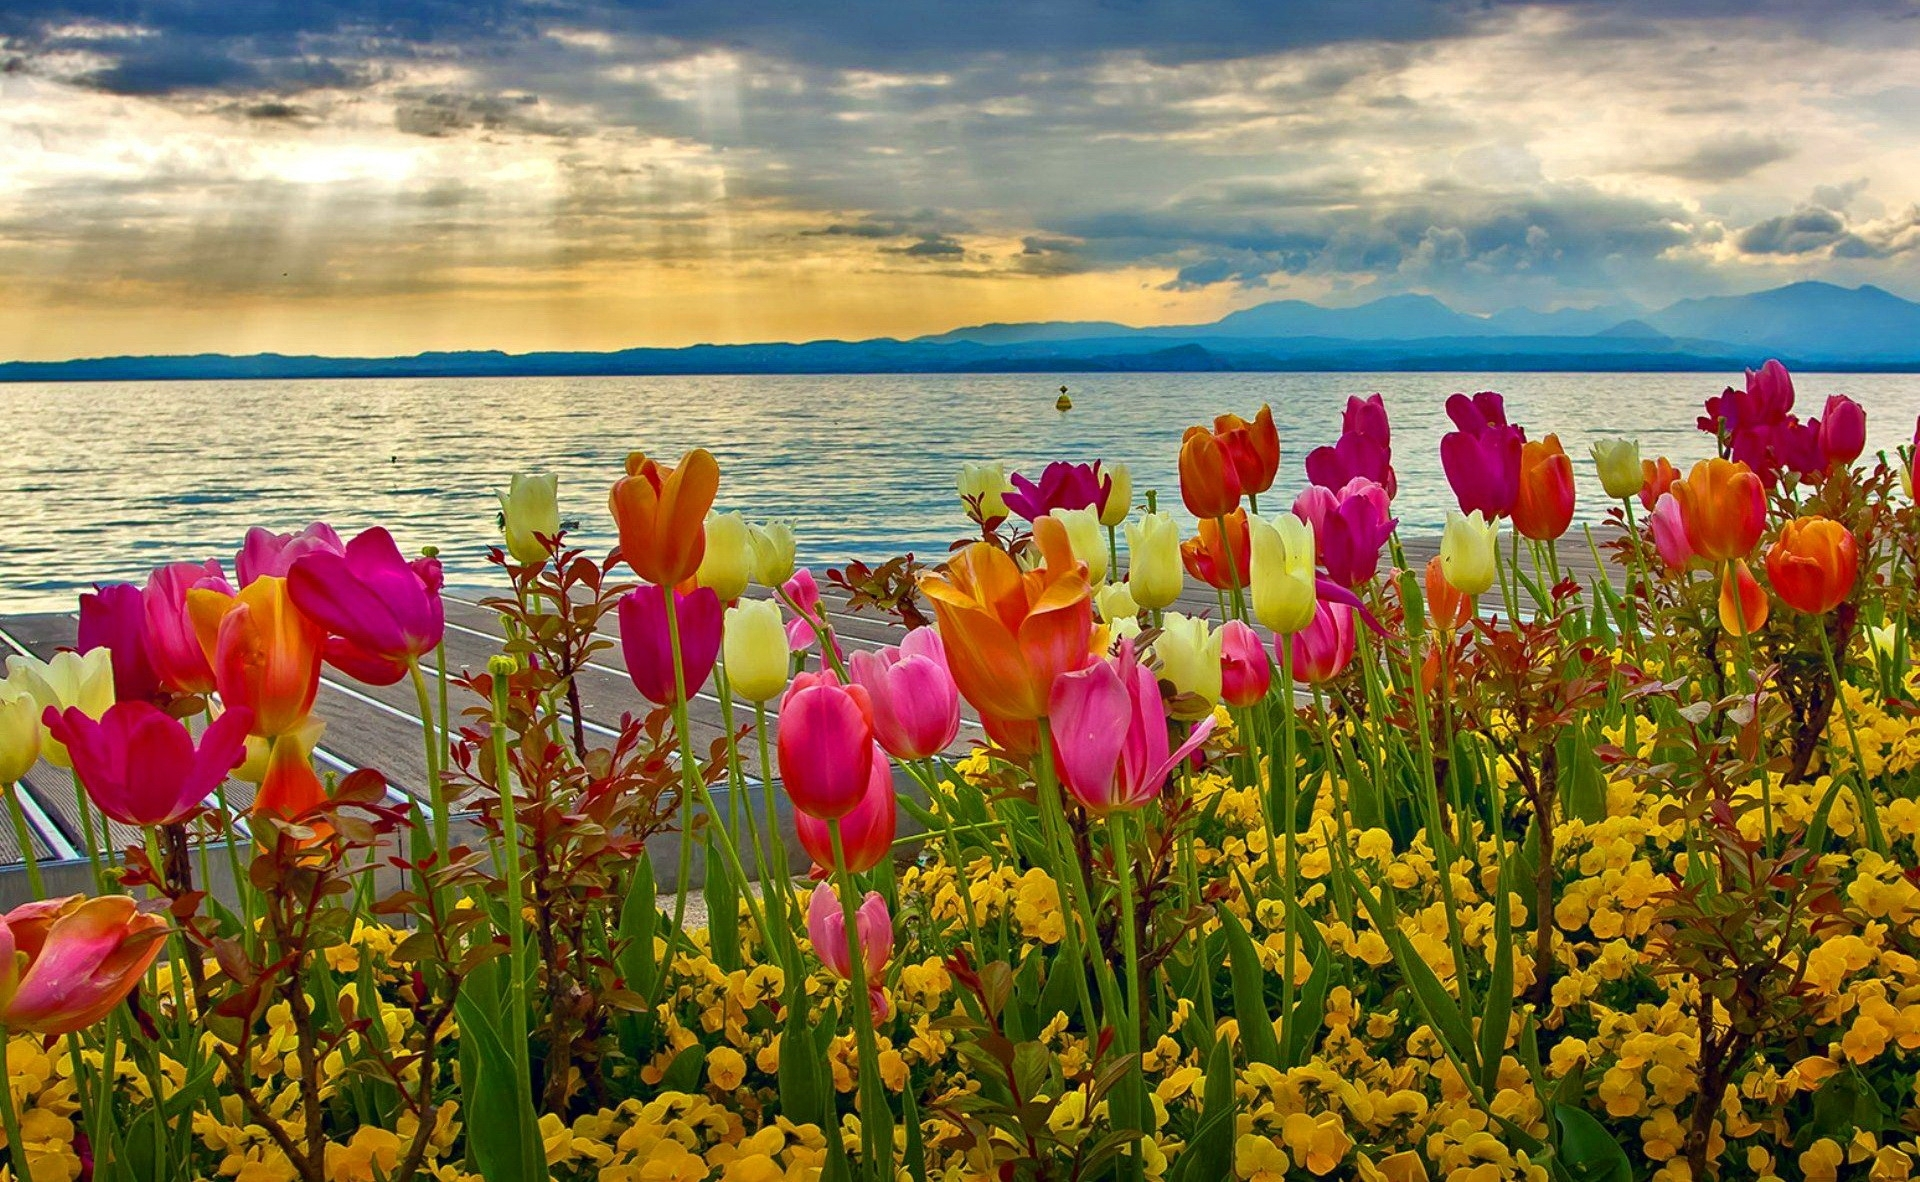 spring flower wallpapers for desktop new - media file | pixelstalk